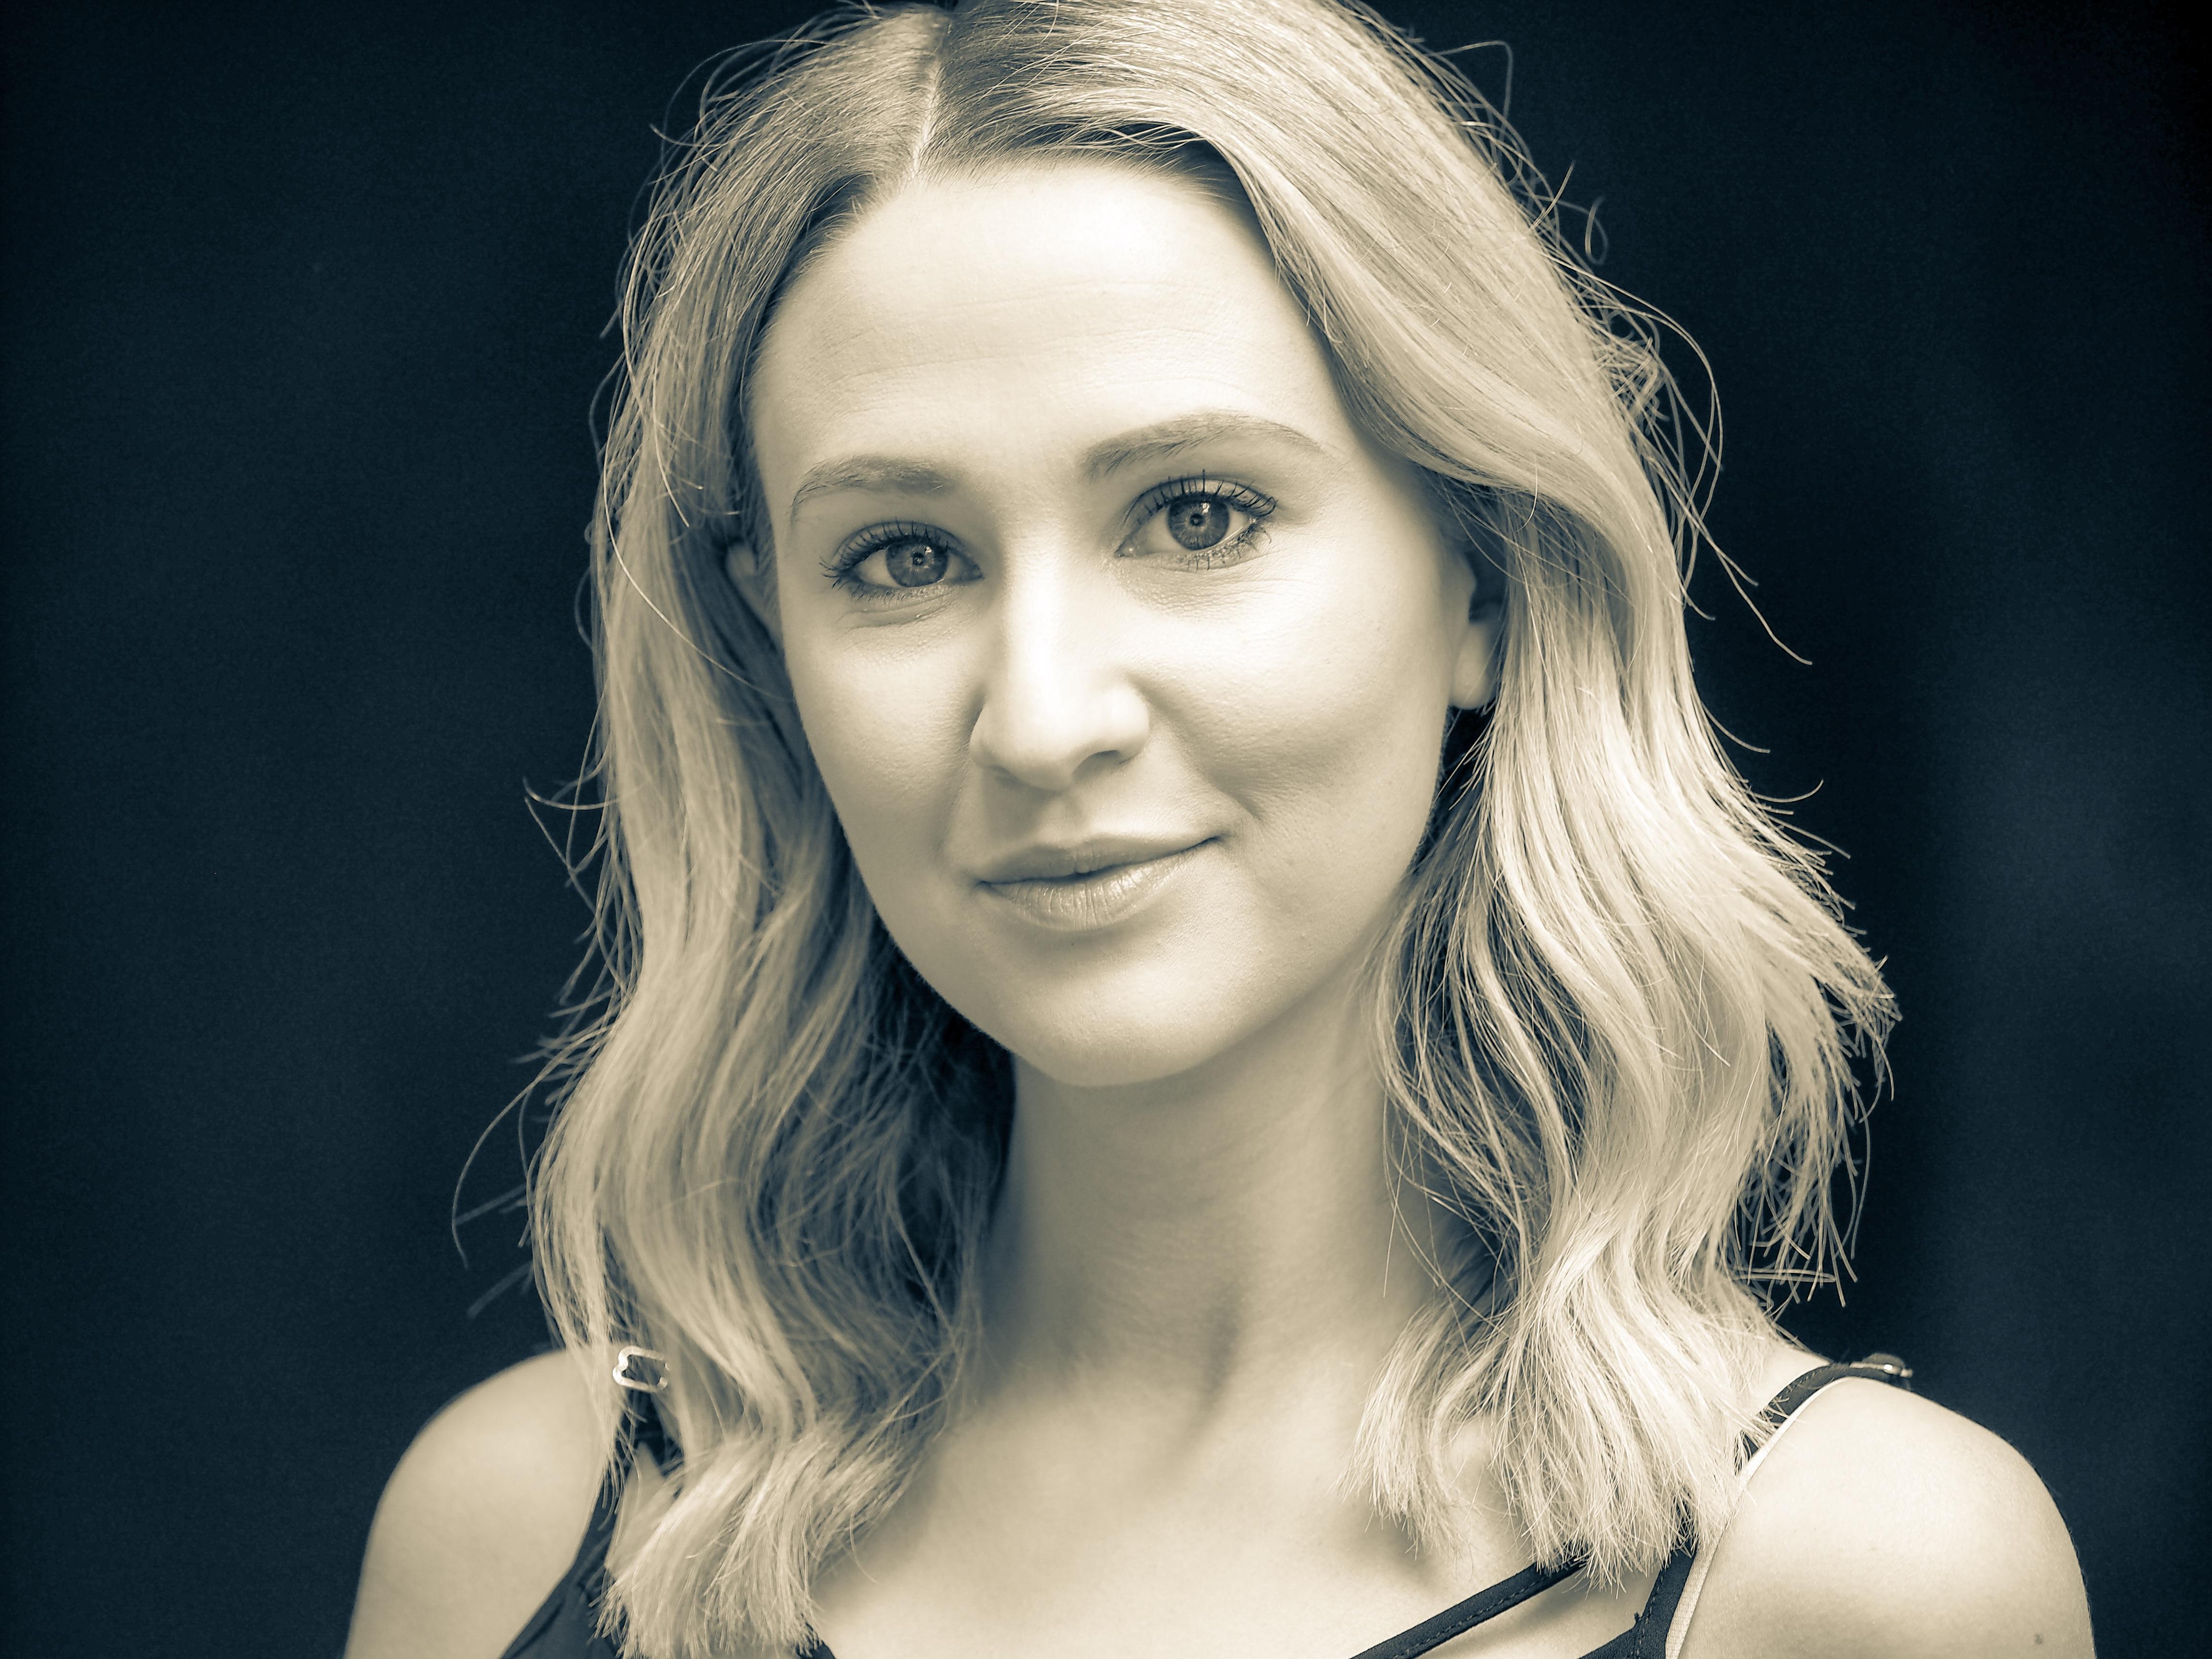 A portrait of Buffy